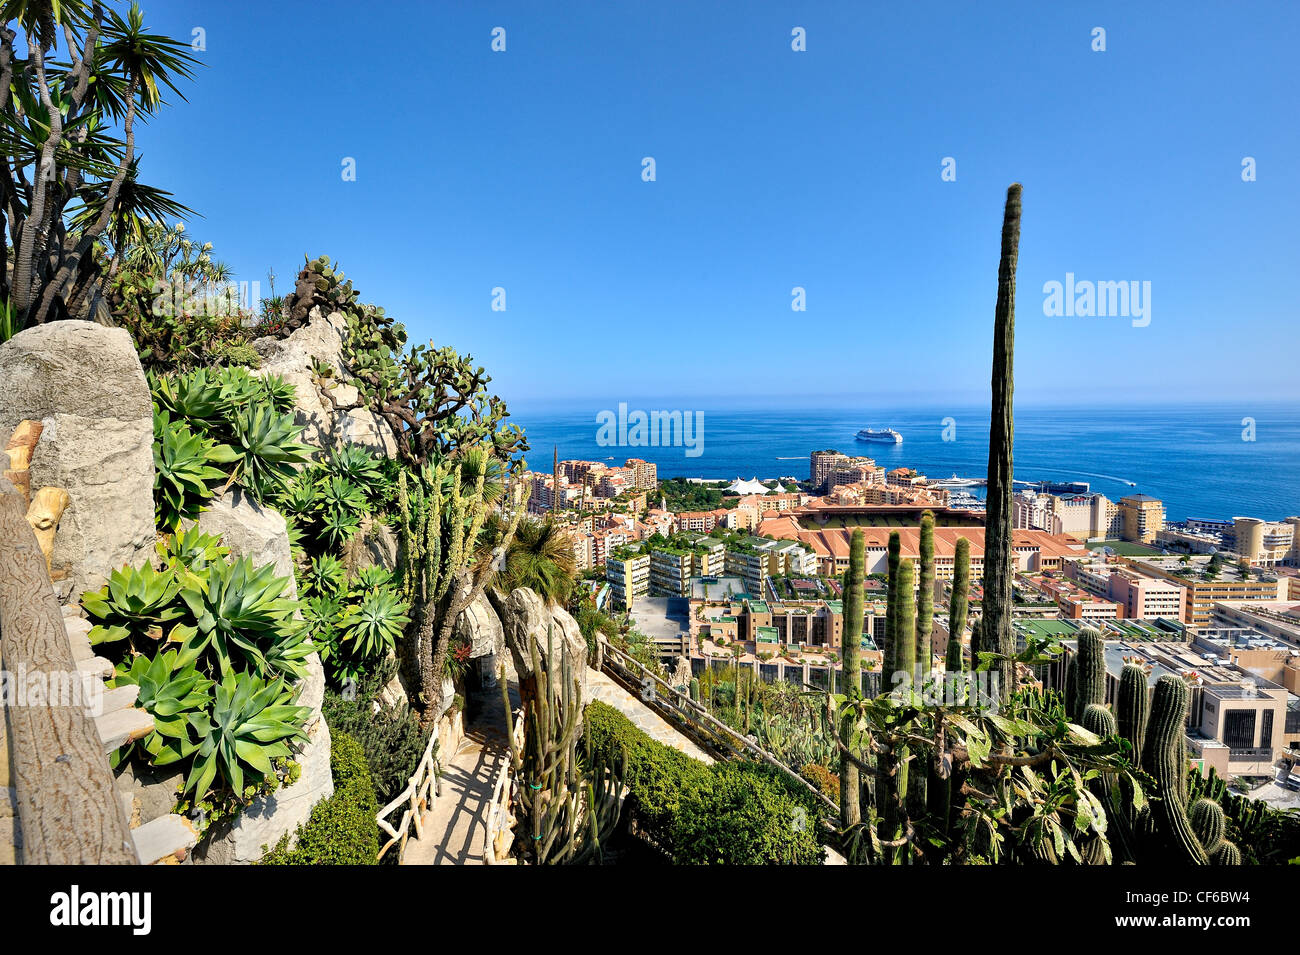 Exotic gardens, Monaco, France. - Stock Image